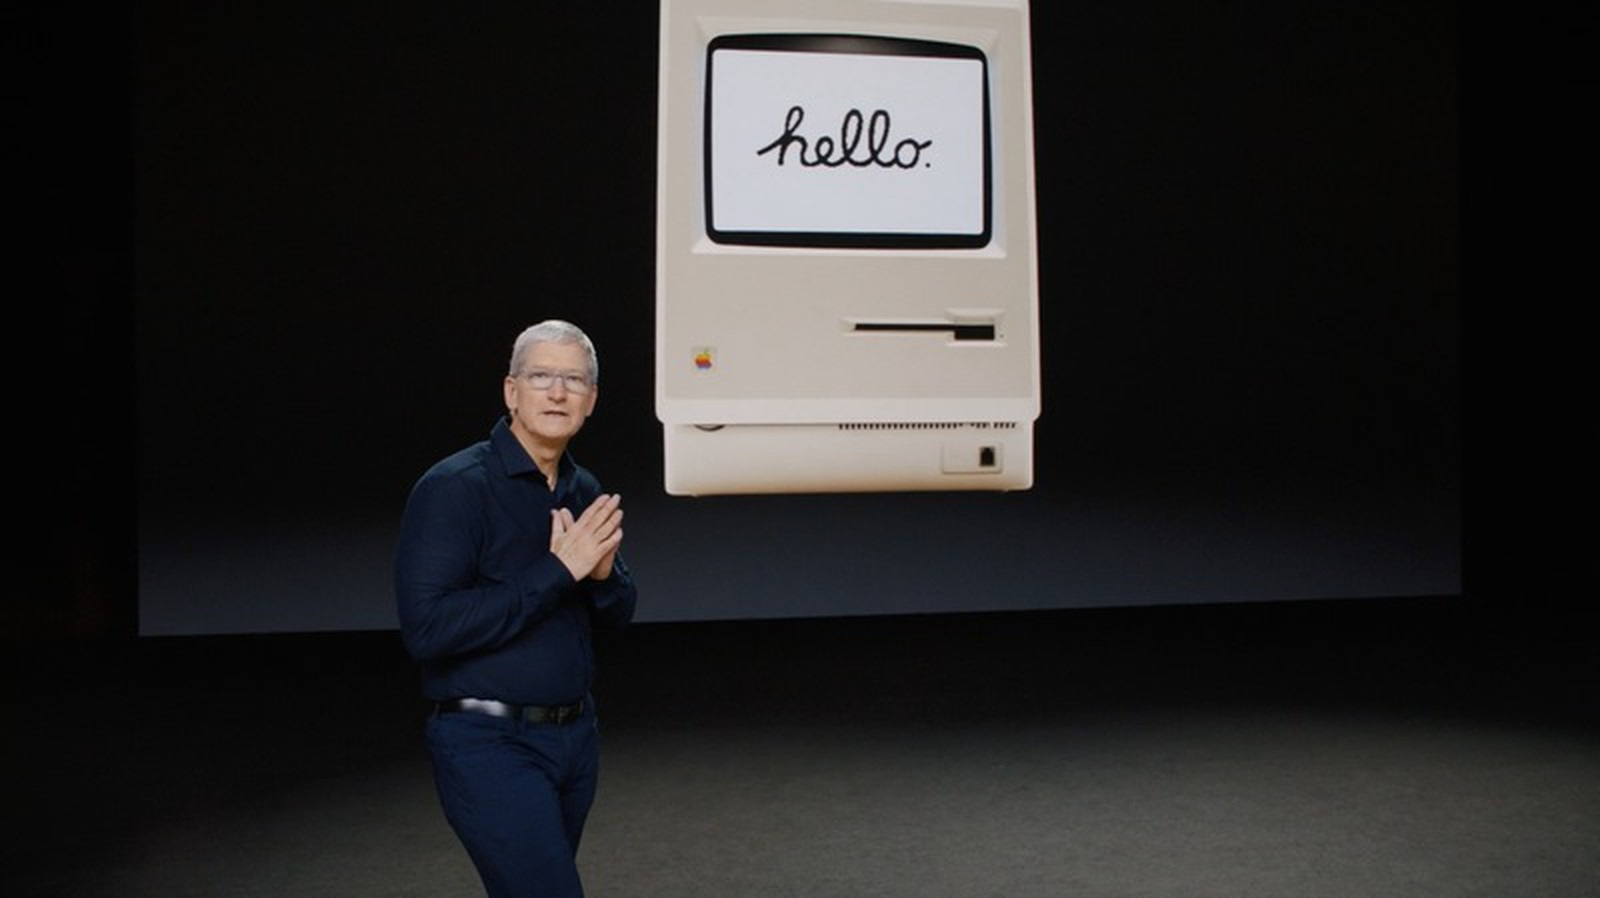 Mac 平台是本届 WWDC 当之无愧的主角